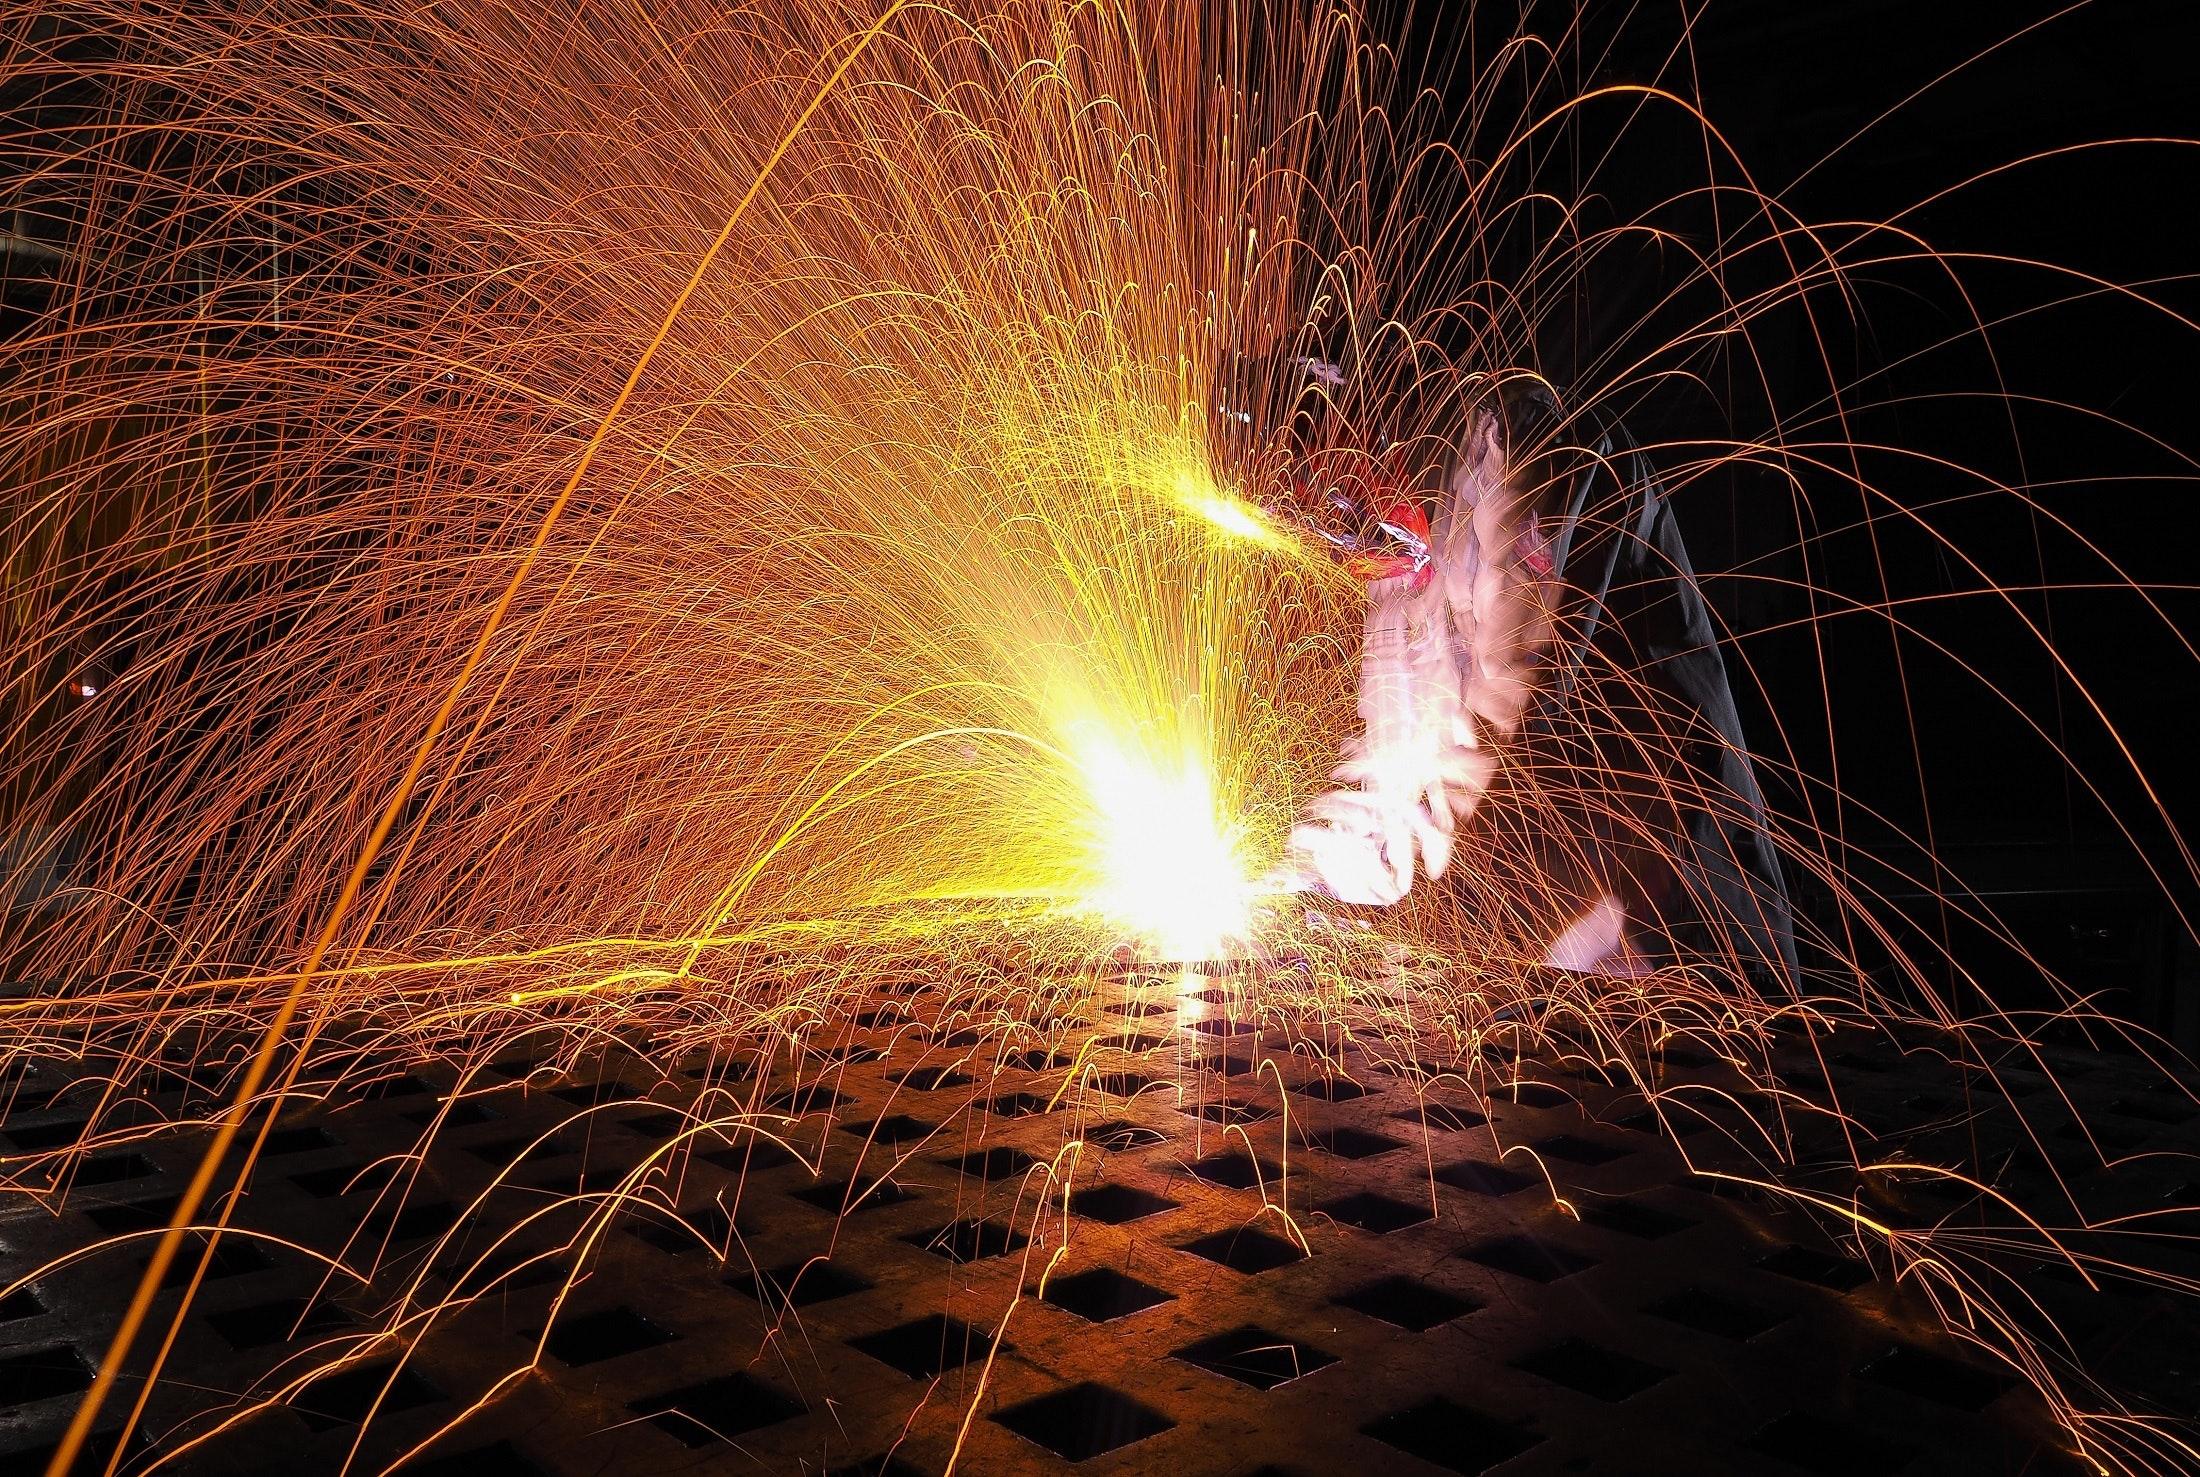 Welding Process, Sparkler, Person, Metal, Sparkling, HQ Photo